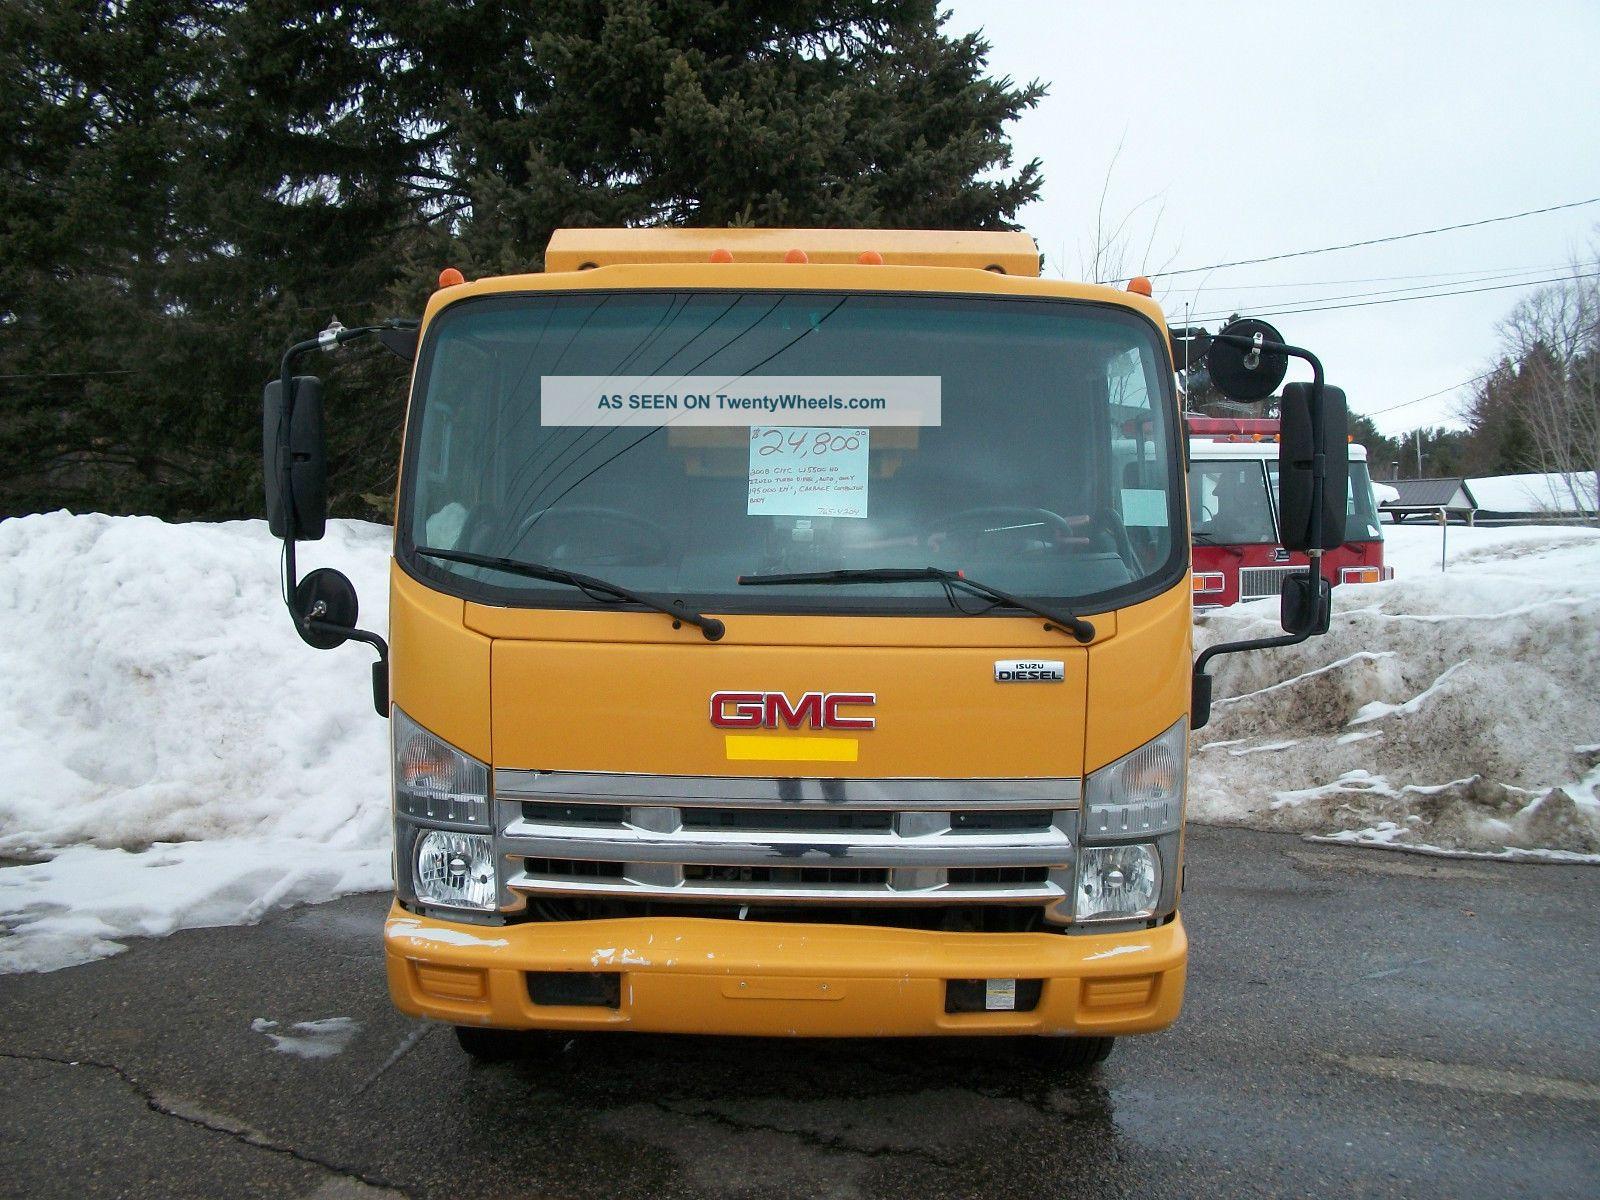 Gmc W5500 Specs Gmc W5500 Hd Gmc Pinterest Gmc Trucks And